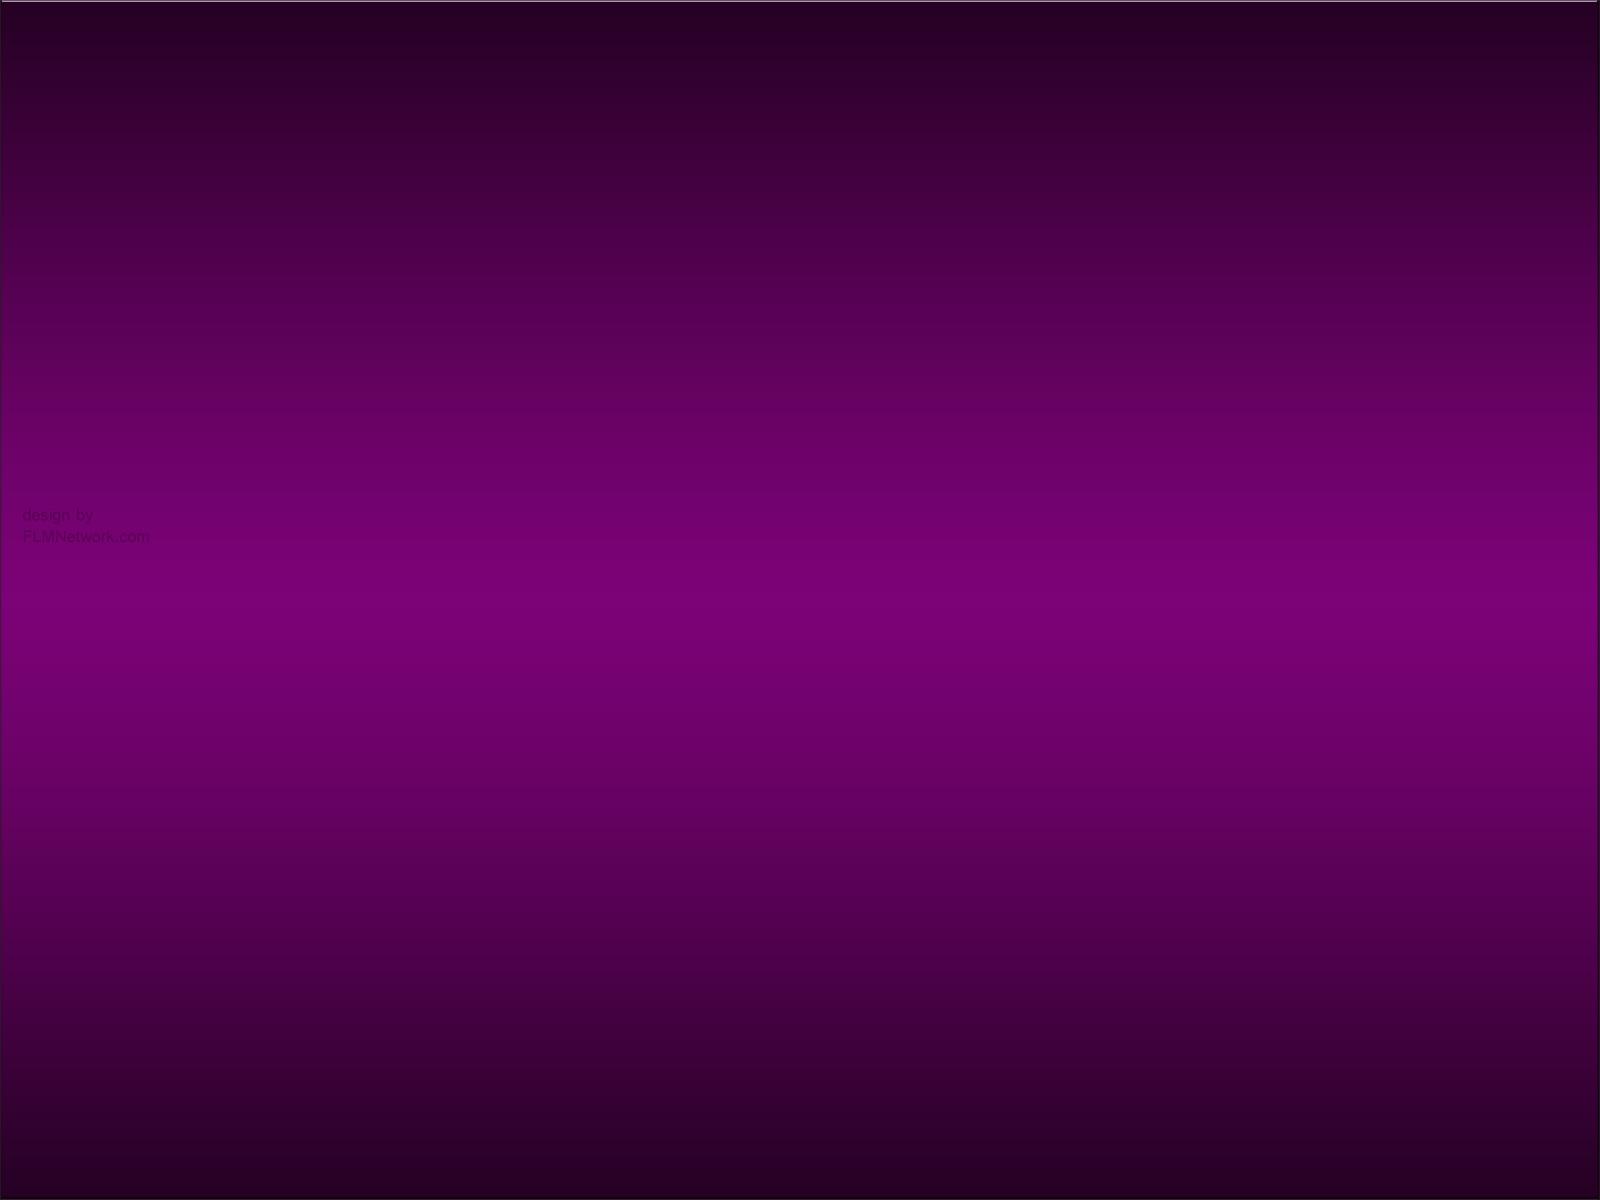 Purple Color Backgrounds Wallpaper Cave Coloring Background